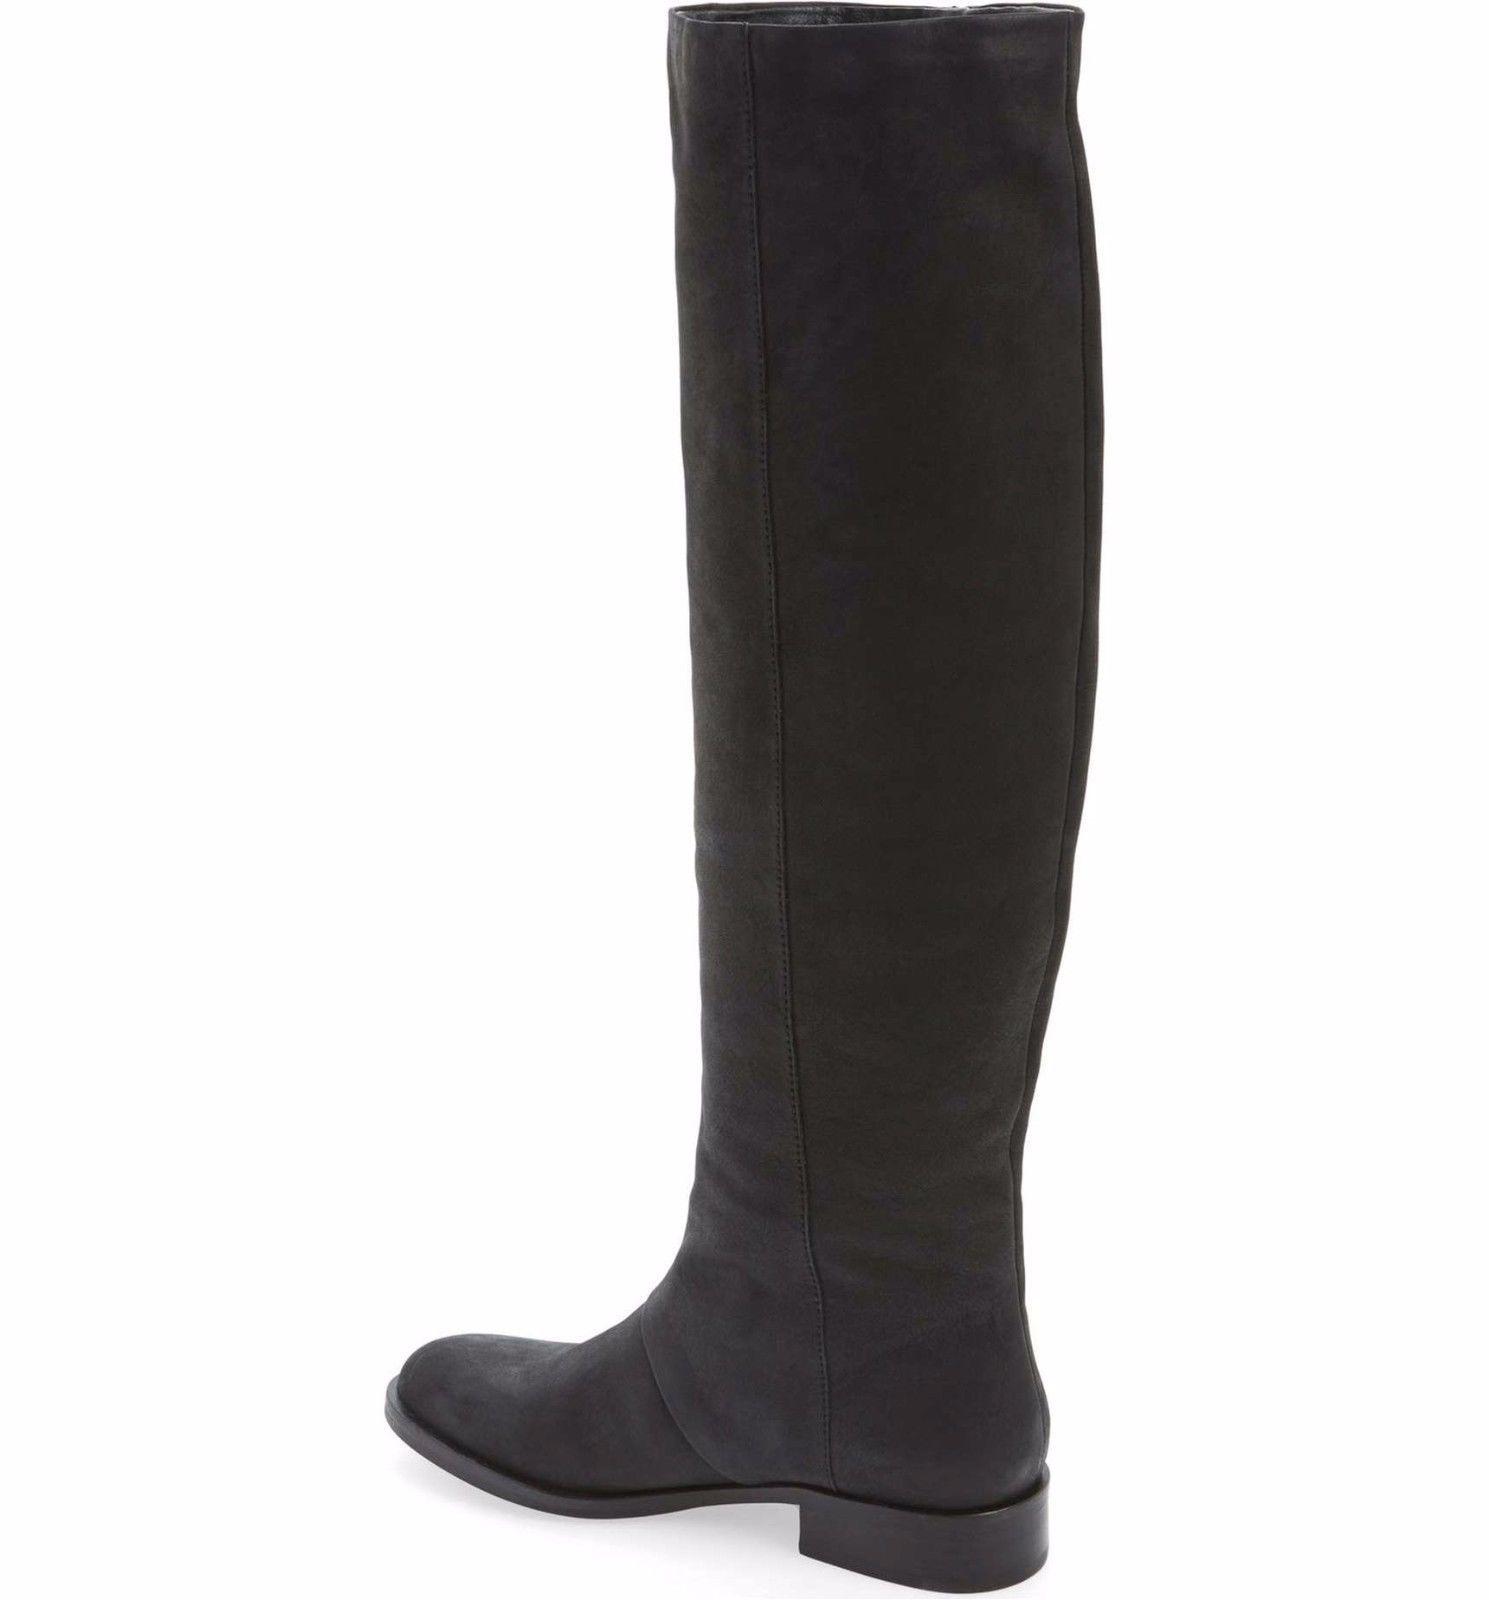 b4be6ce800d9  275 SAM EDELMAN New Josephine Tall Fringe Leather Riding Boots Black 5